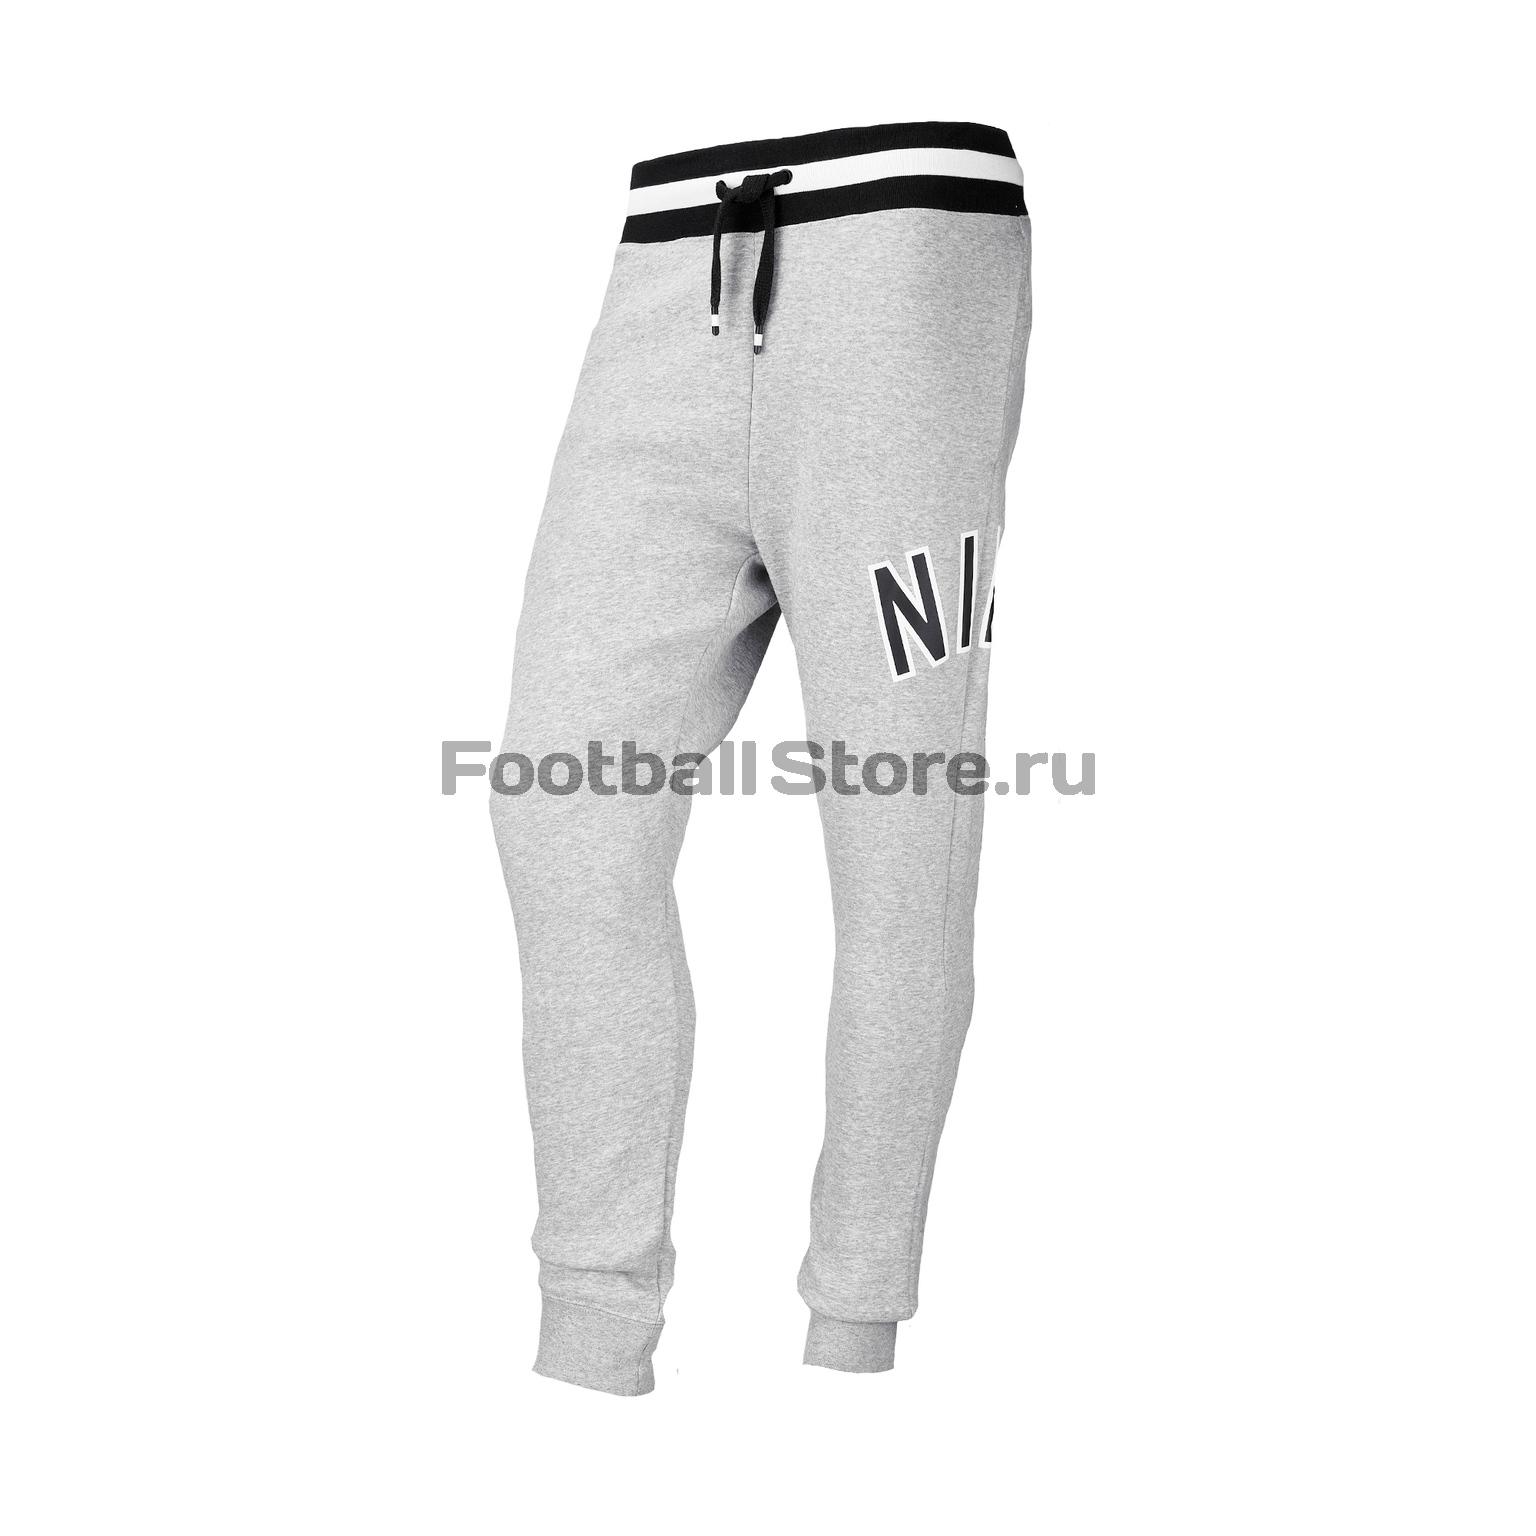 Брюки Nike Nike Air Pant AR1824-063